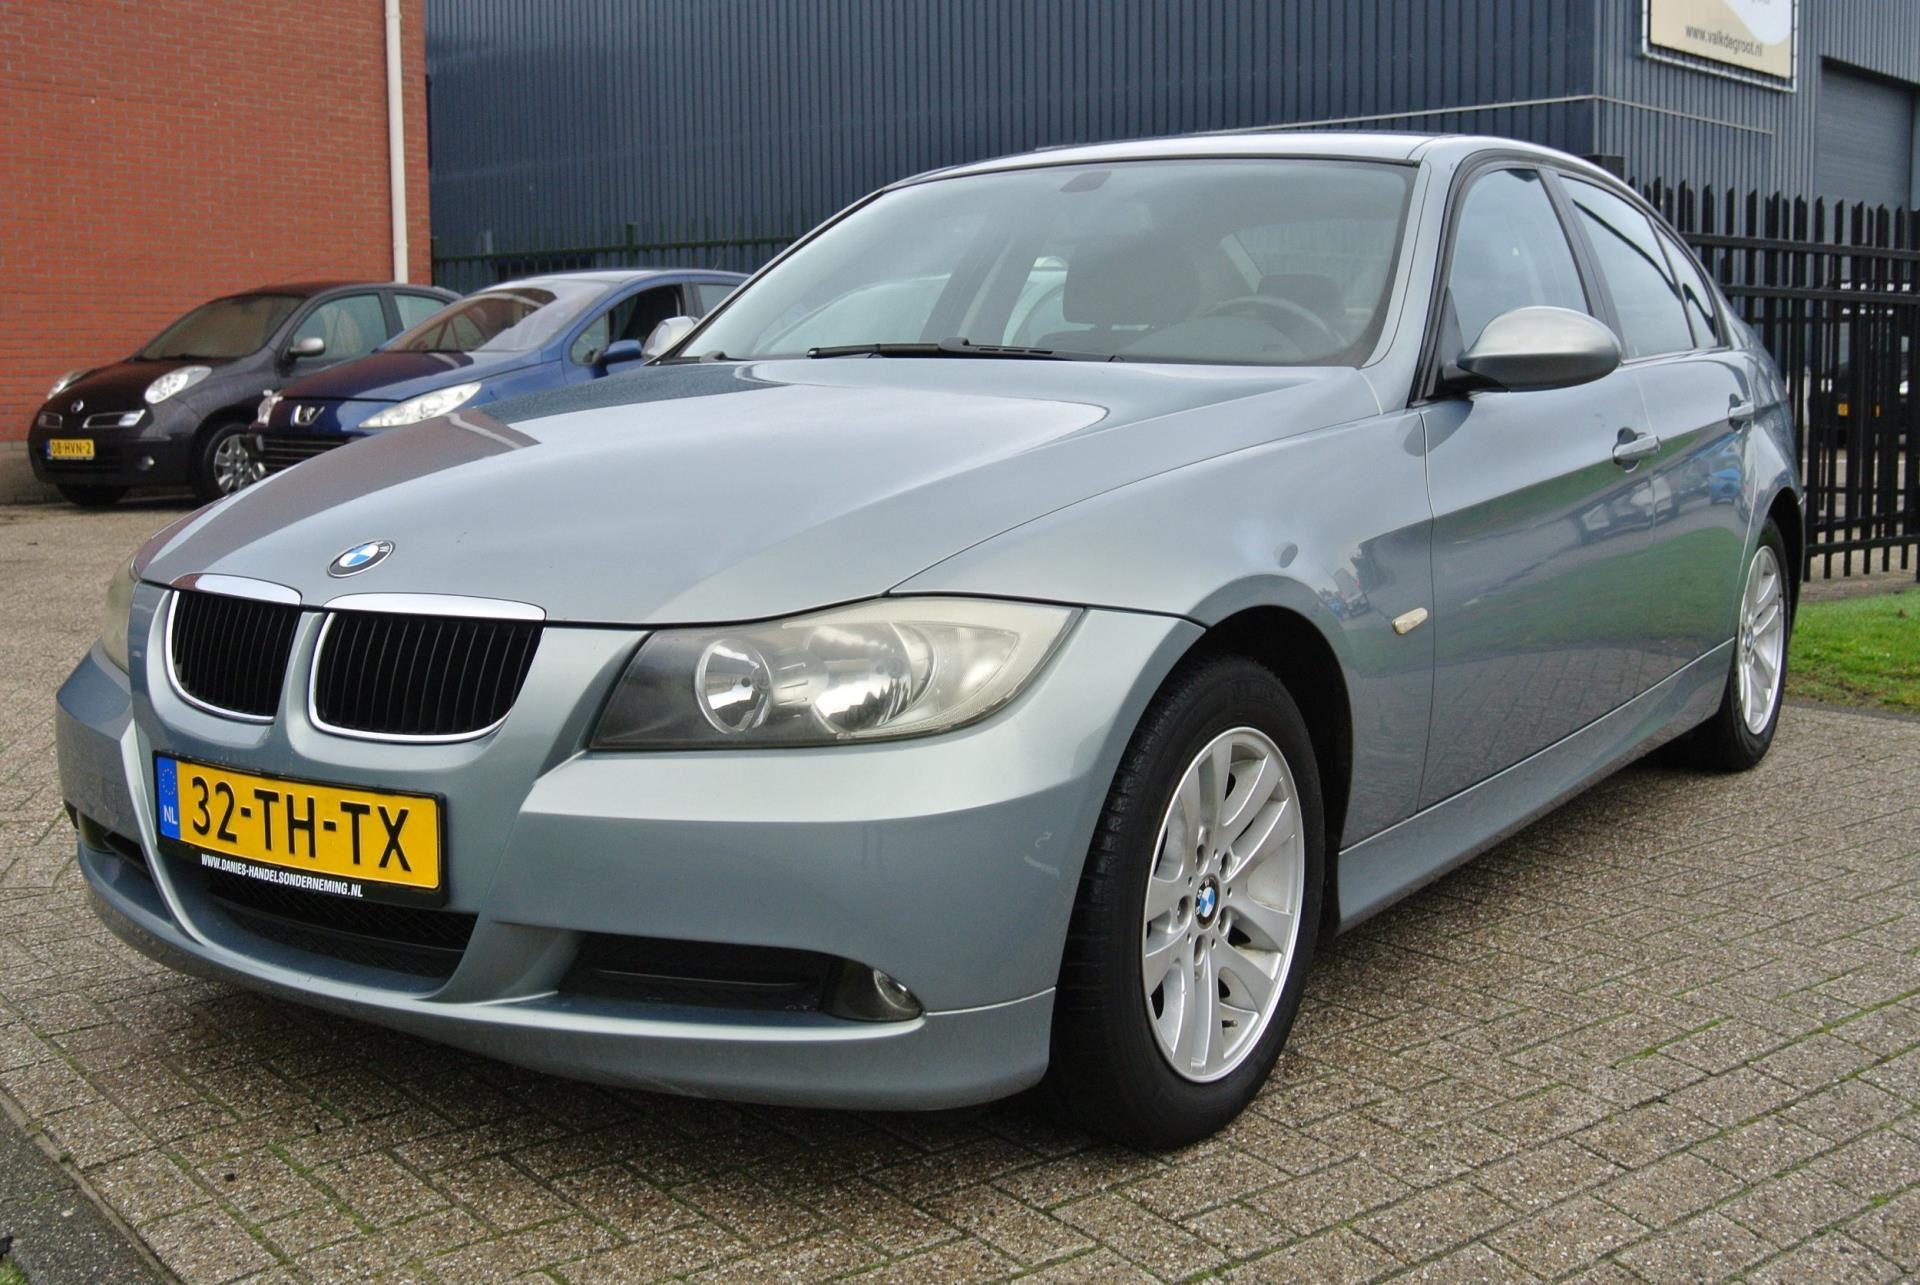 BMW 3-serie occasion - Danie's Handelsonderneming